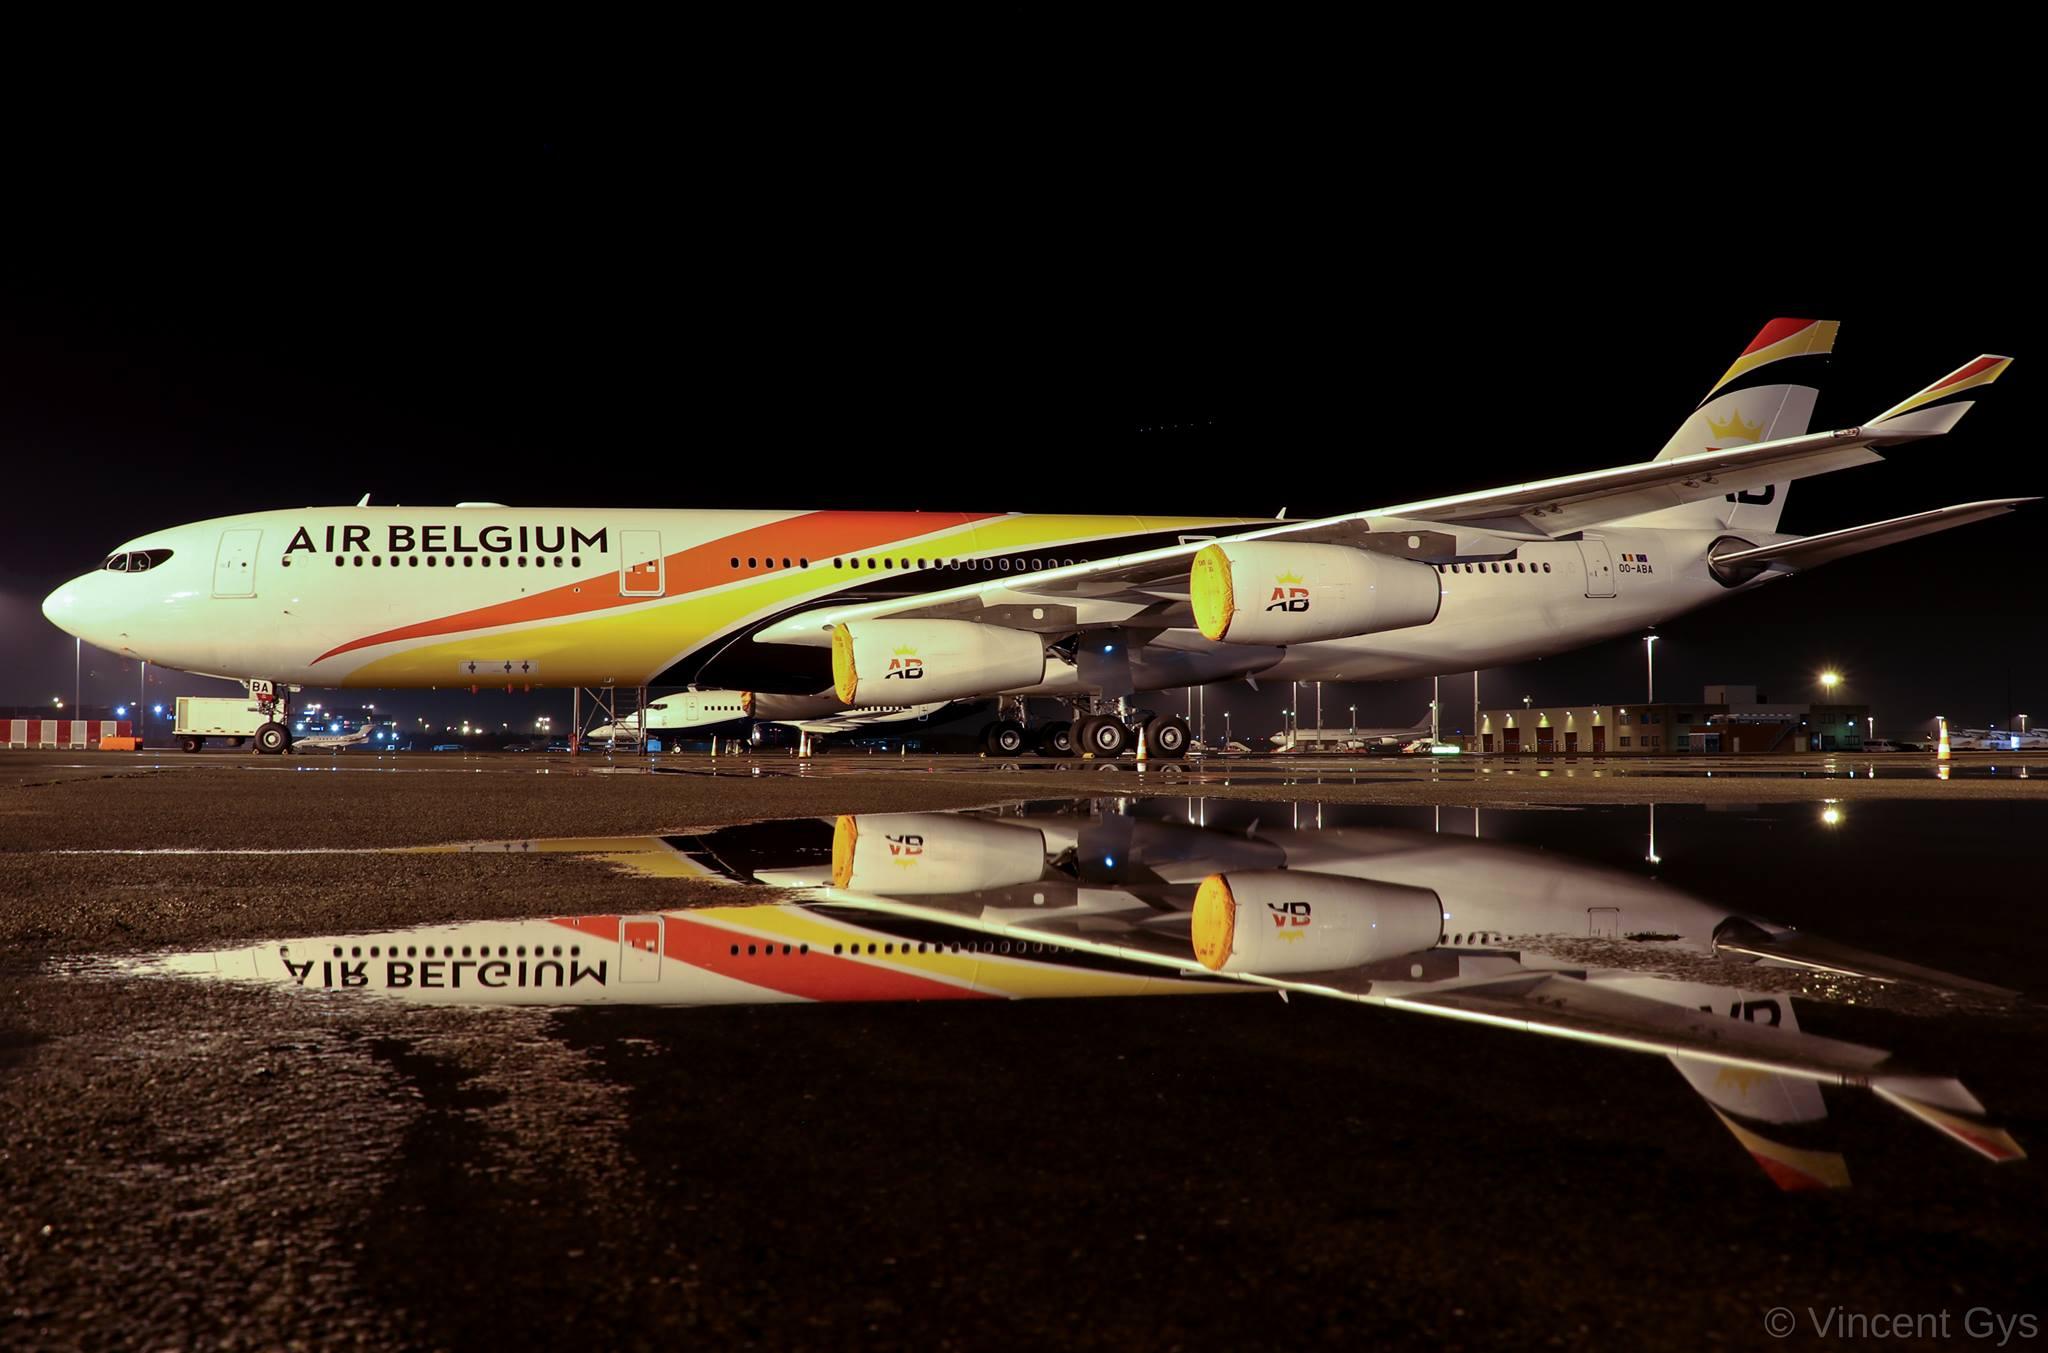 Air Belgium Airbus A340-300 – reg. OO-ABA. (Foto: Vincent Gys)